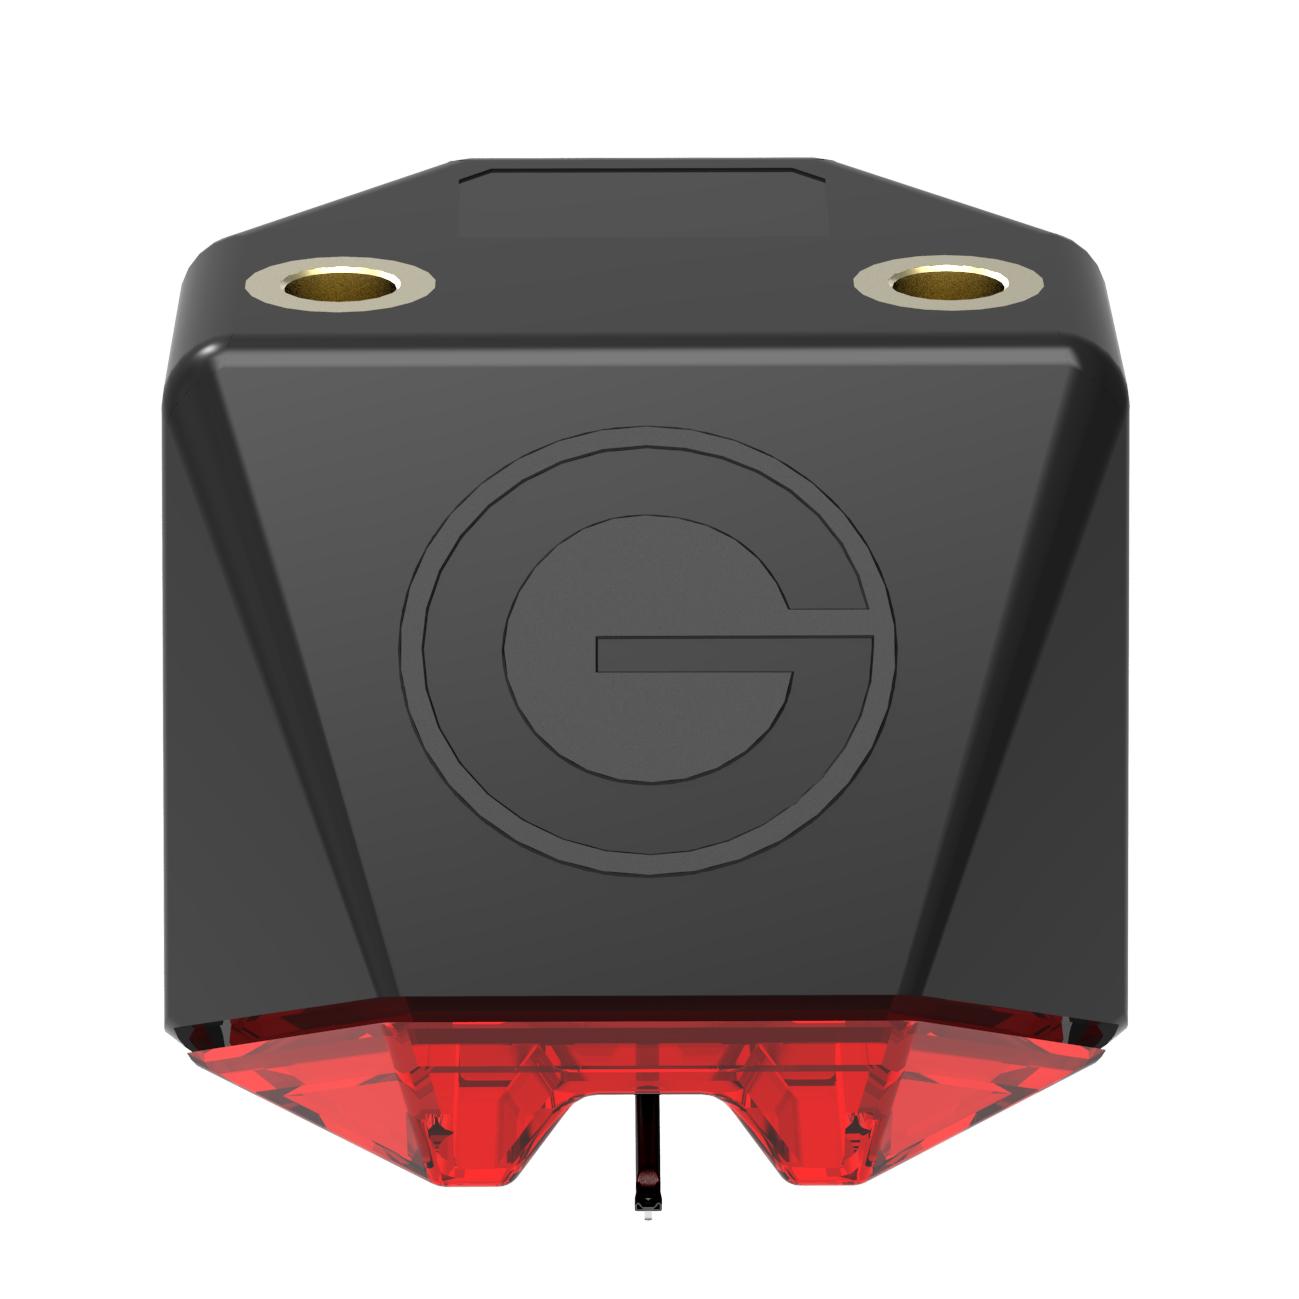 E1-cartridge-front-angle_222768_1.jpg